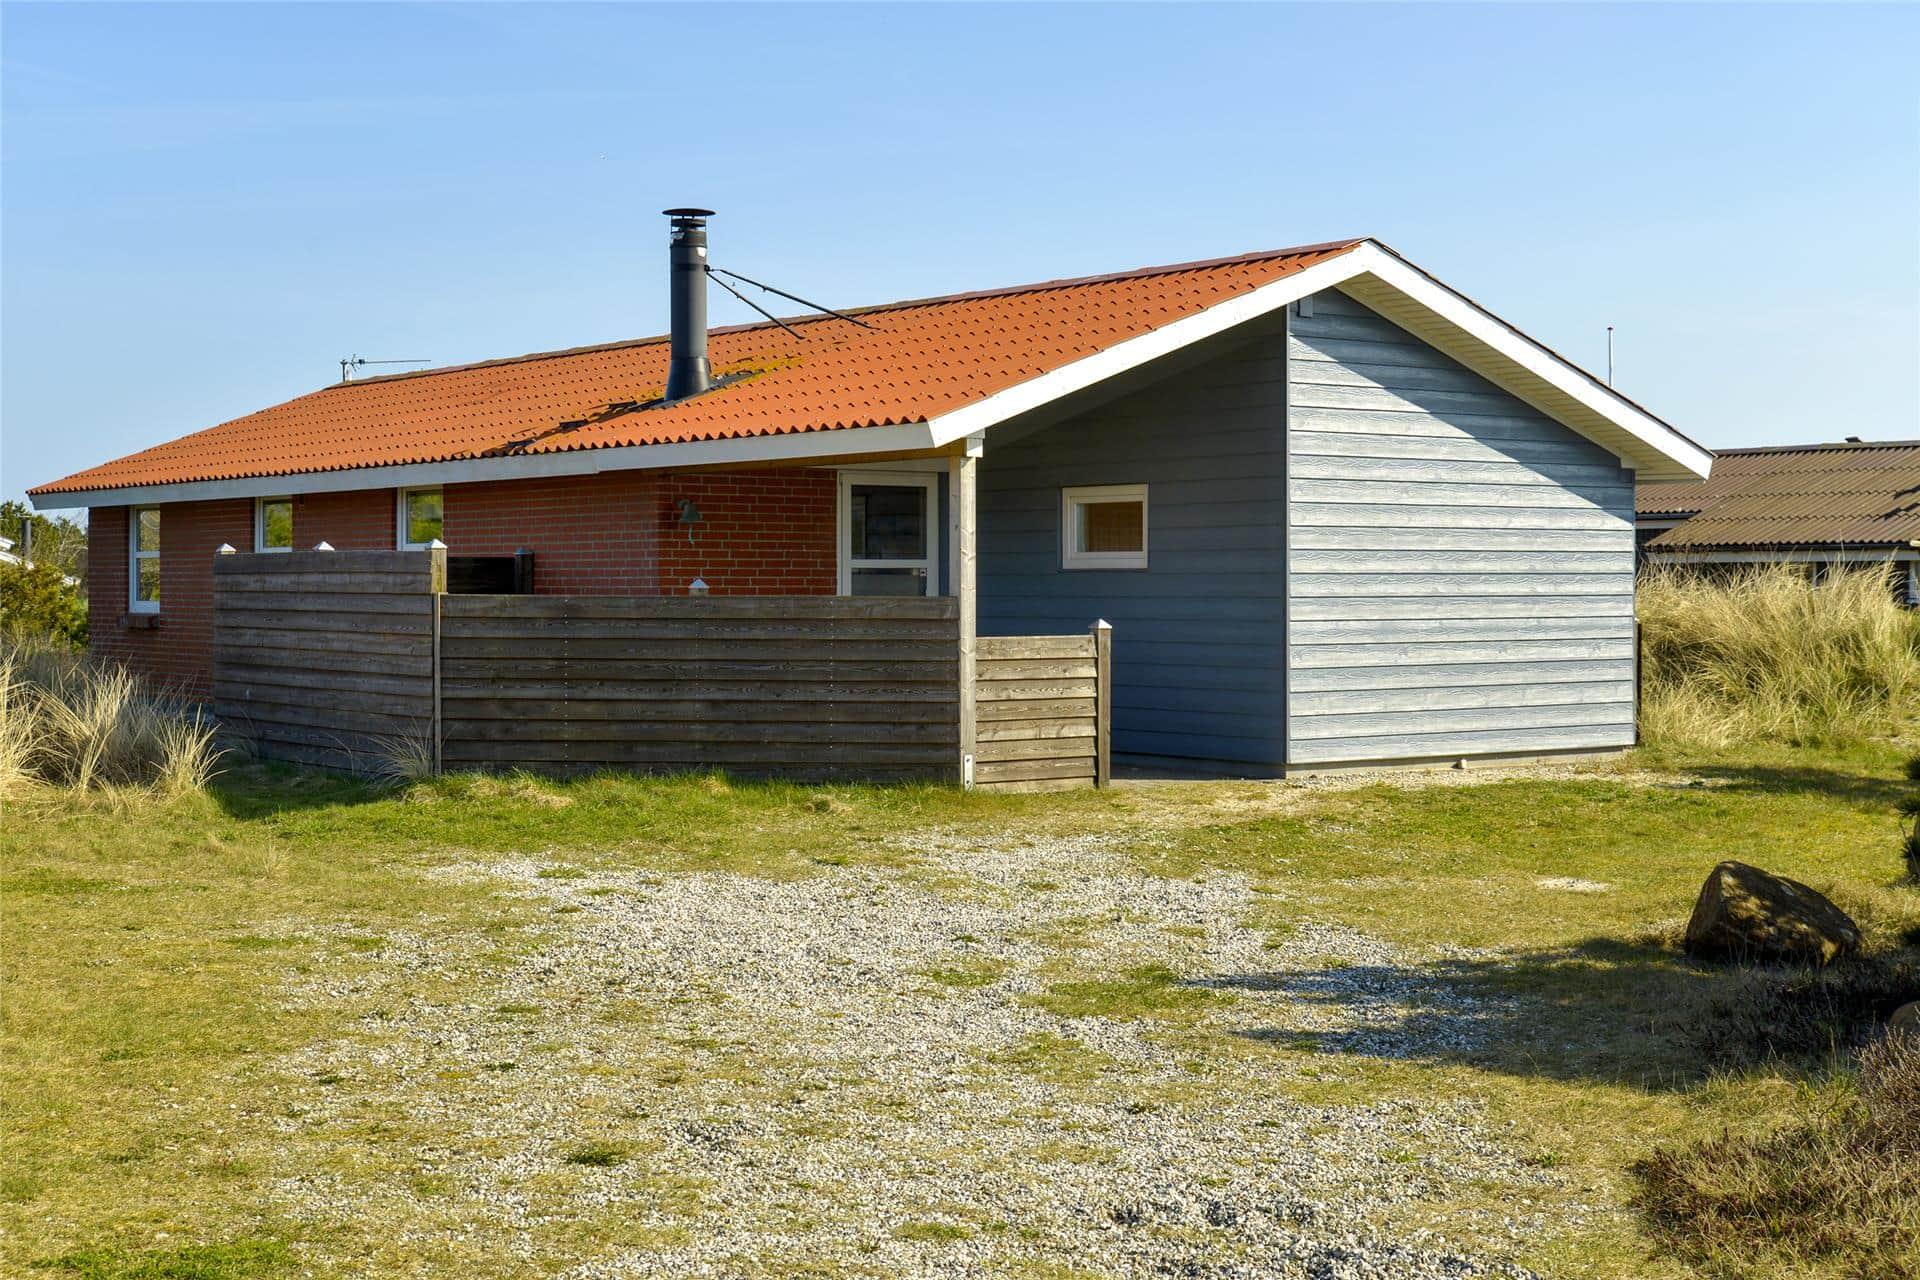 Bild 1-4 Ferienhaus 640, Dortheasvej 6, DK - 6960 Hvide Sande